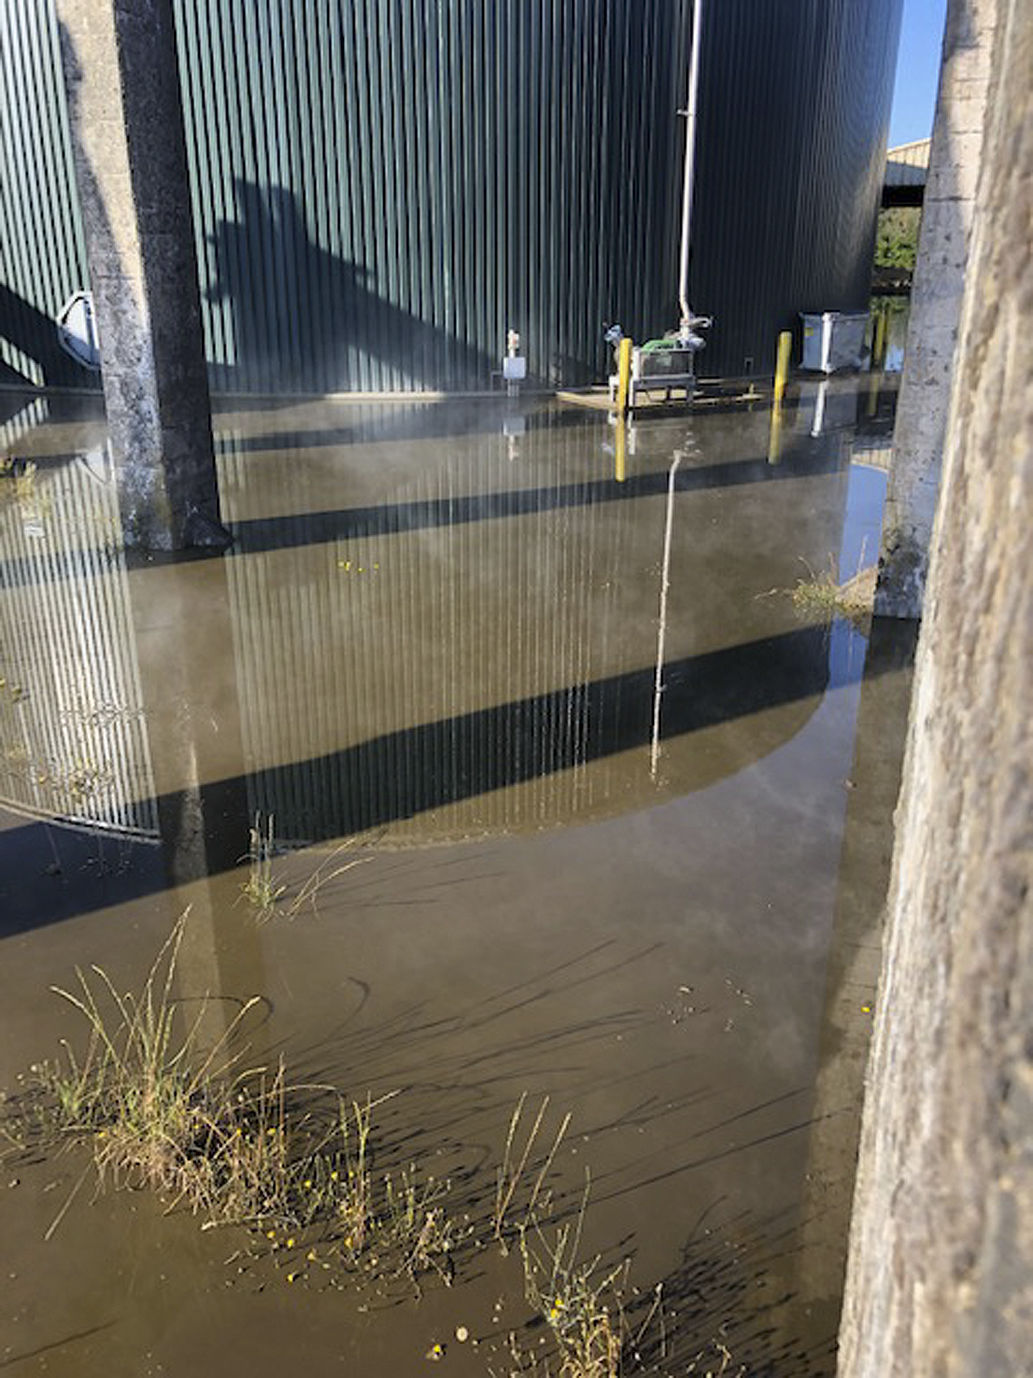 Cleanup underway after manure digester spill near Tillamook